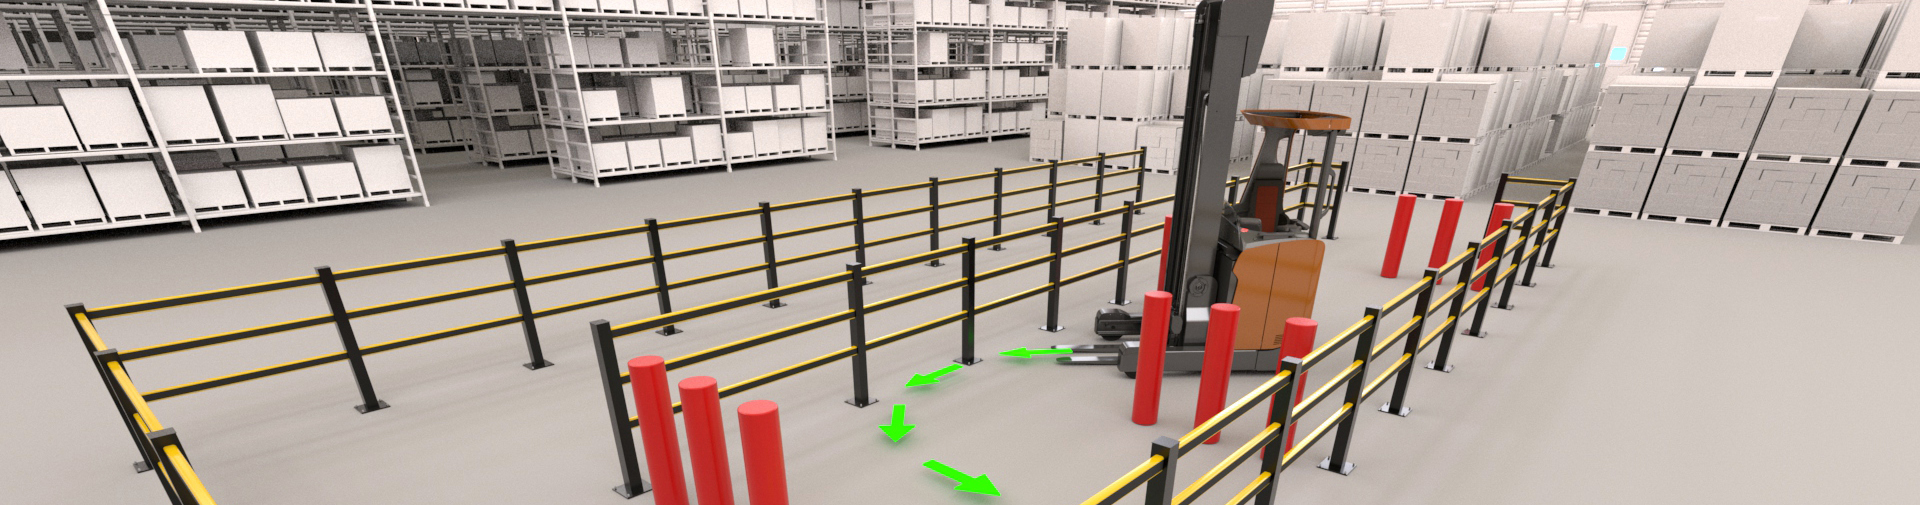 Reachtruck simulator environment training